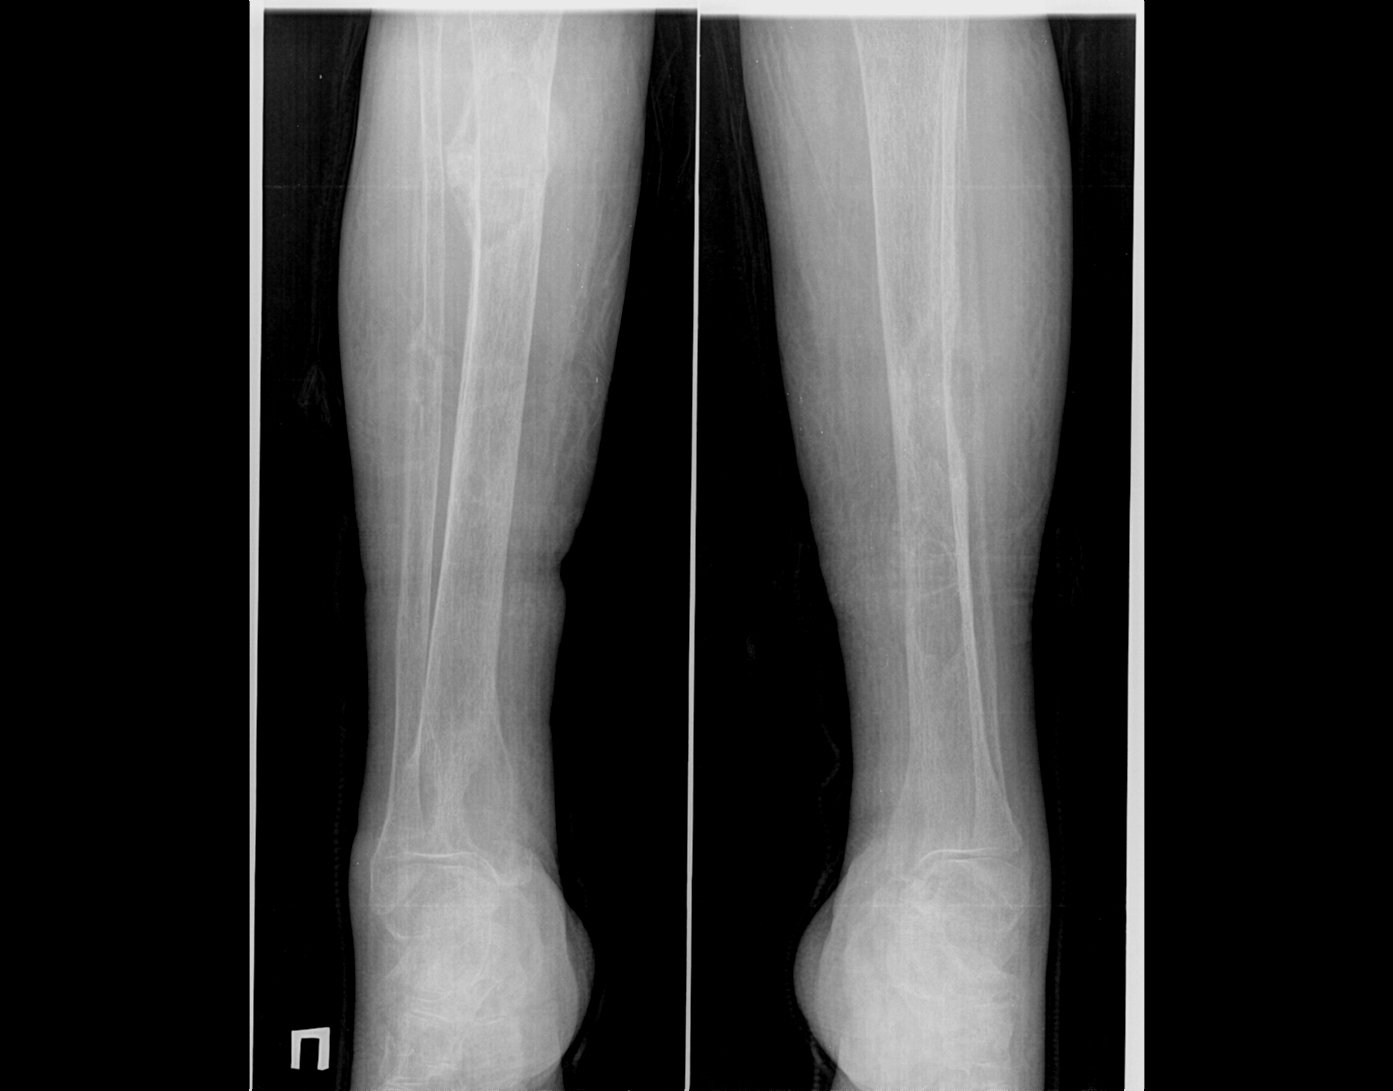 Остеодистрофия фото